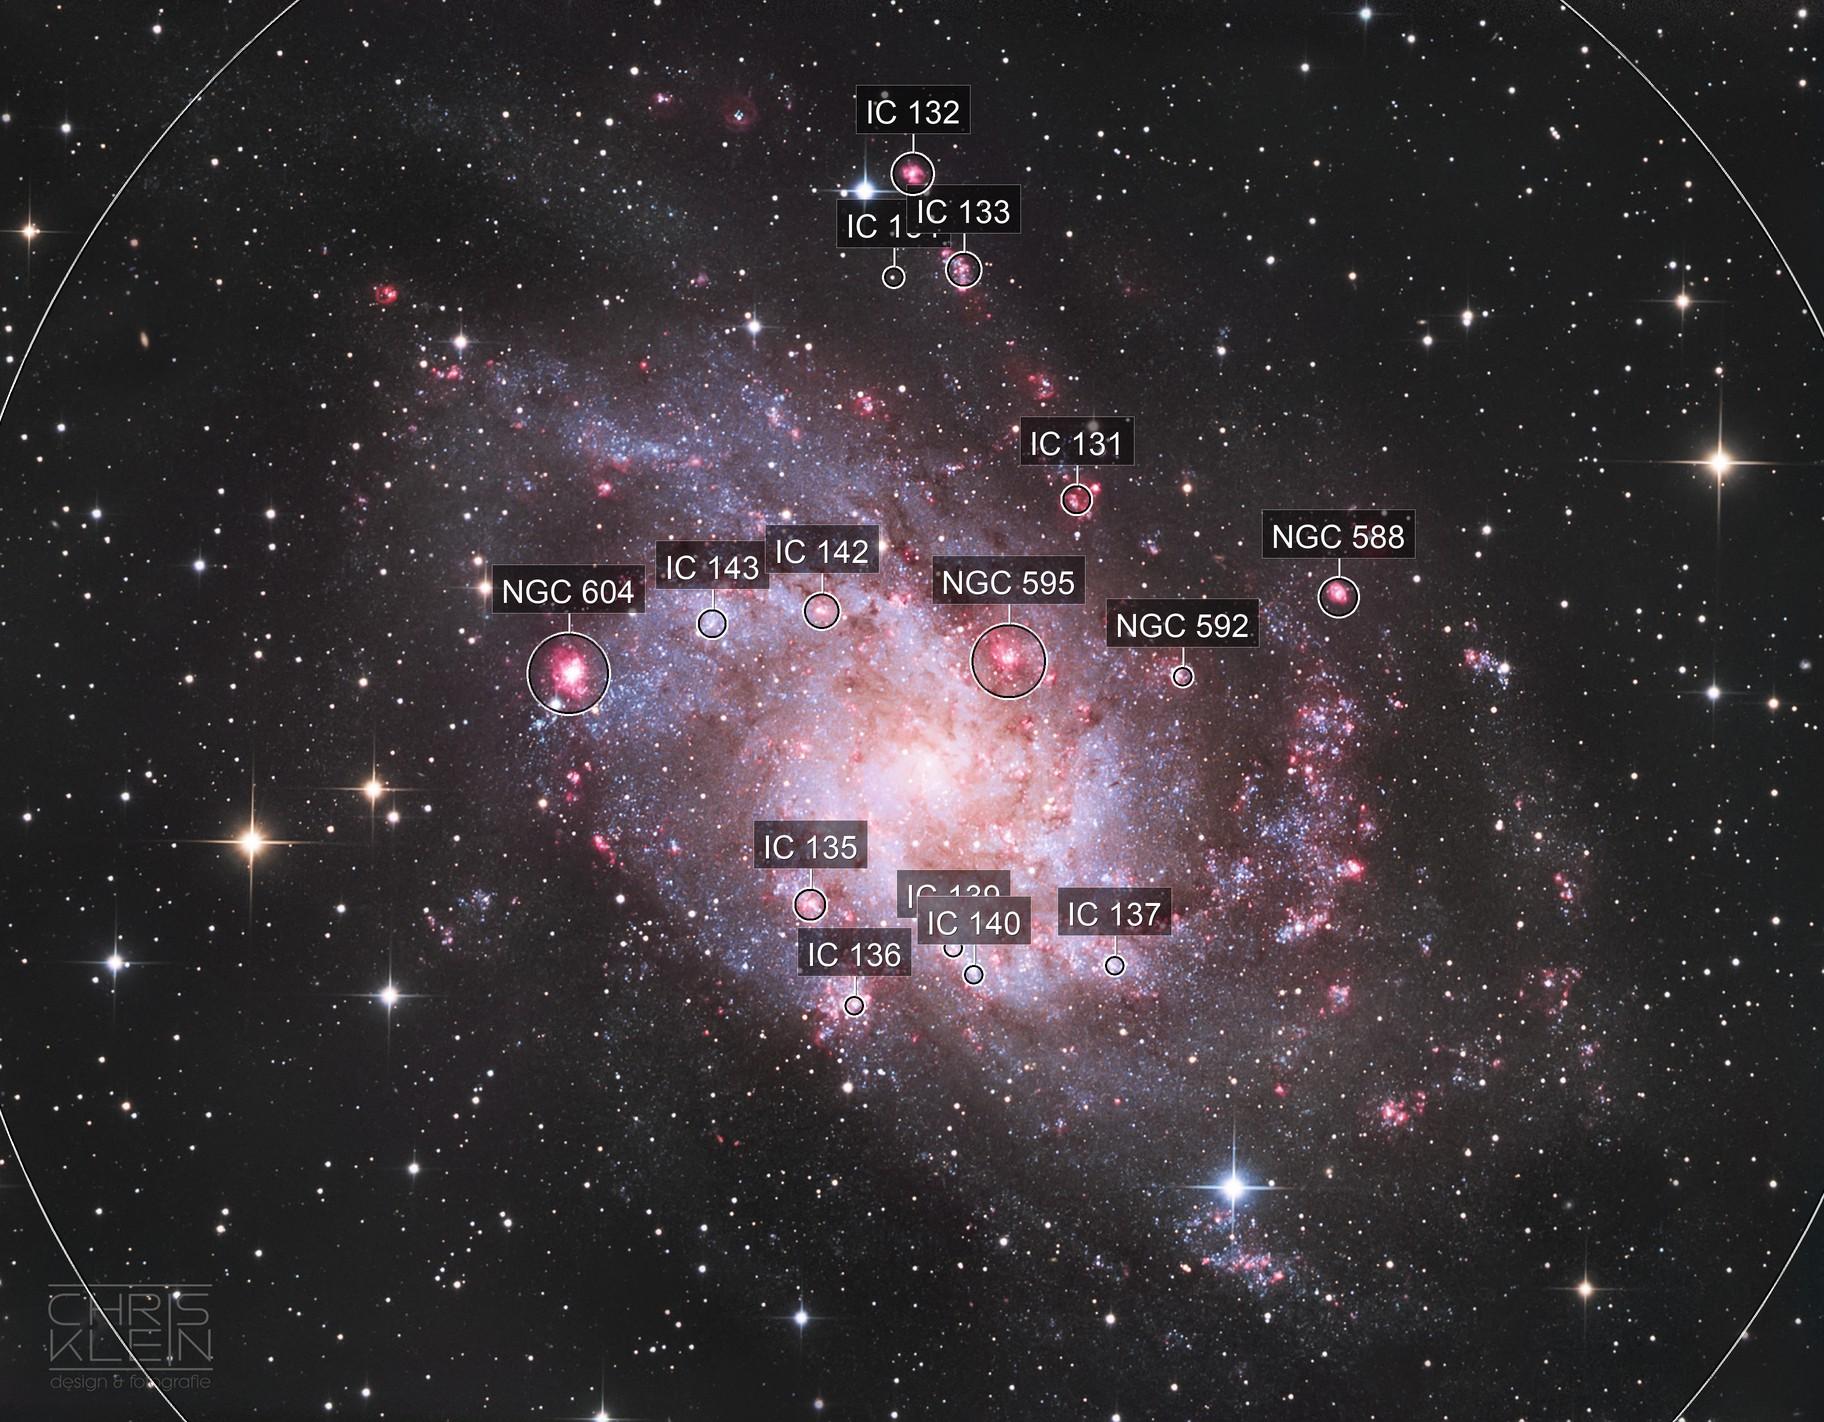 M 33 / Dreiecksgalaxie - Triangulum Galaxy